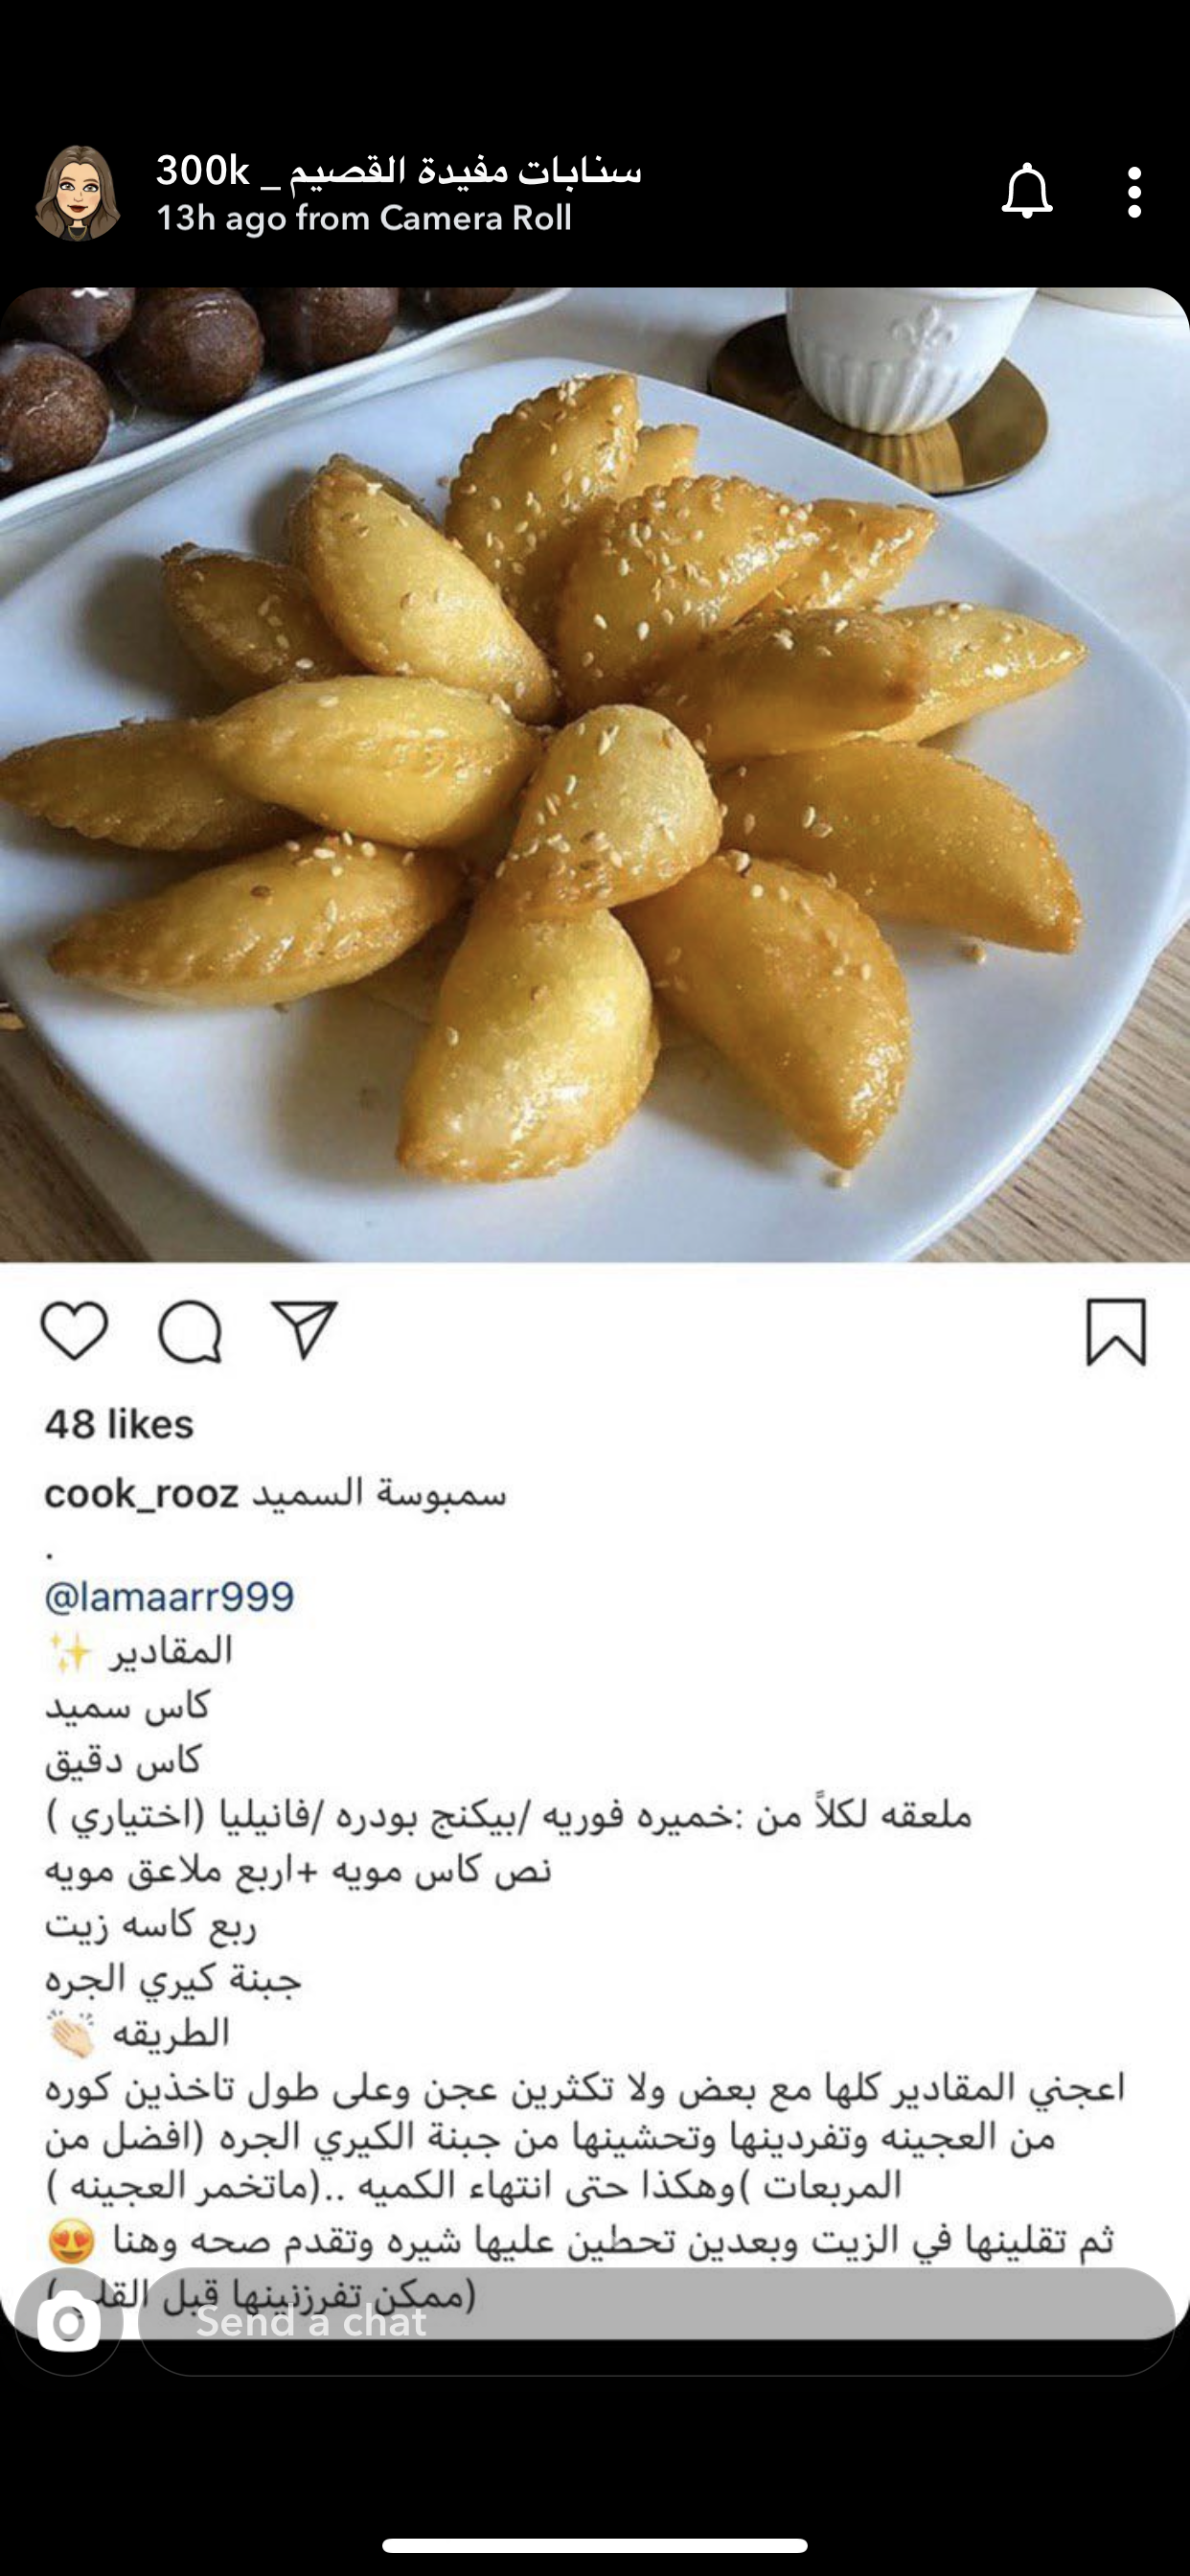 Pin By Douae Aya On Arabic Food In 2020 Food Recipies Cooking Food